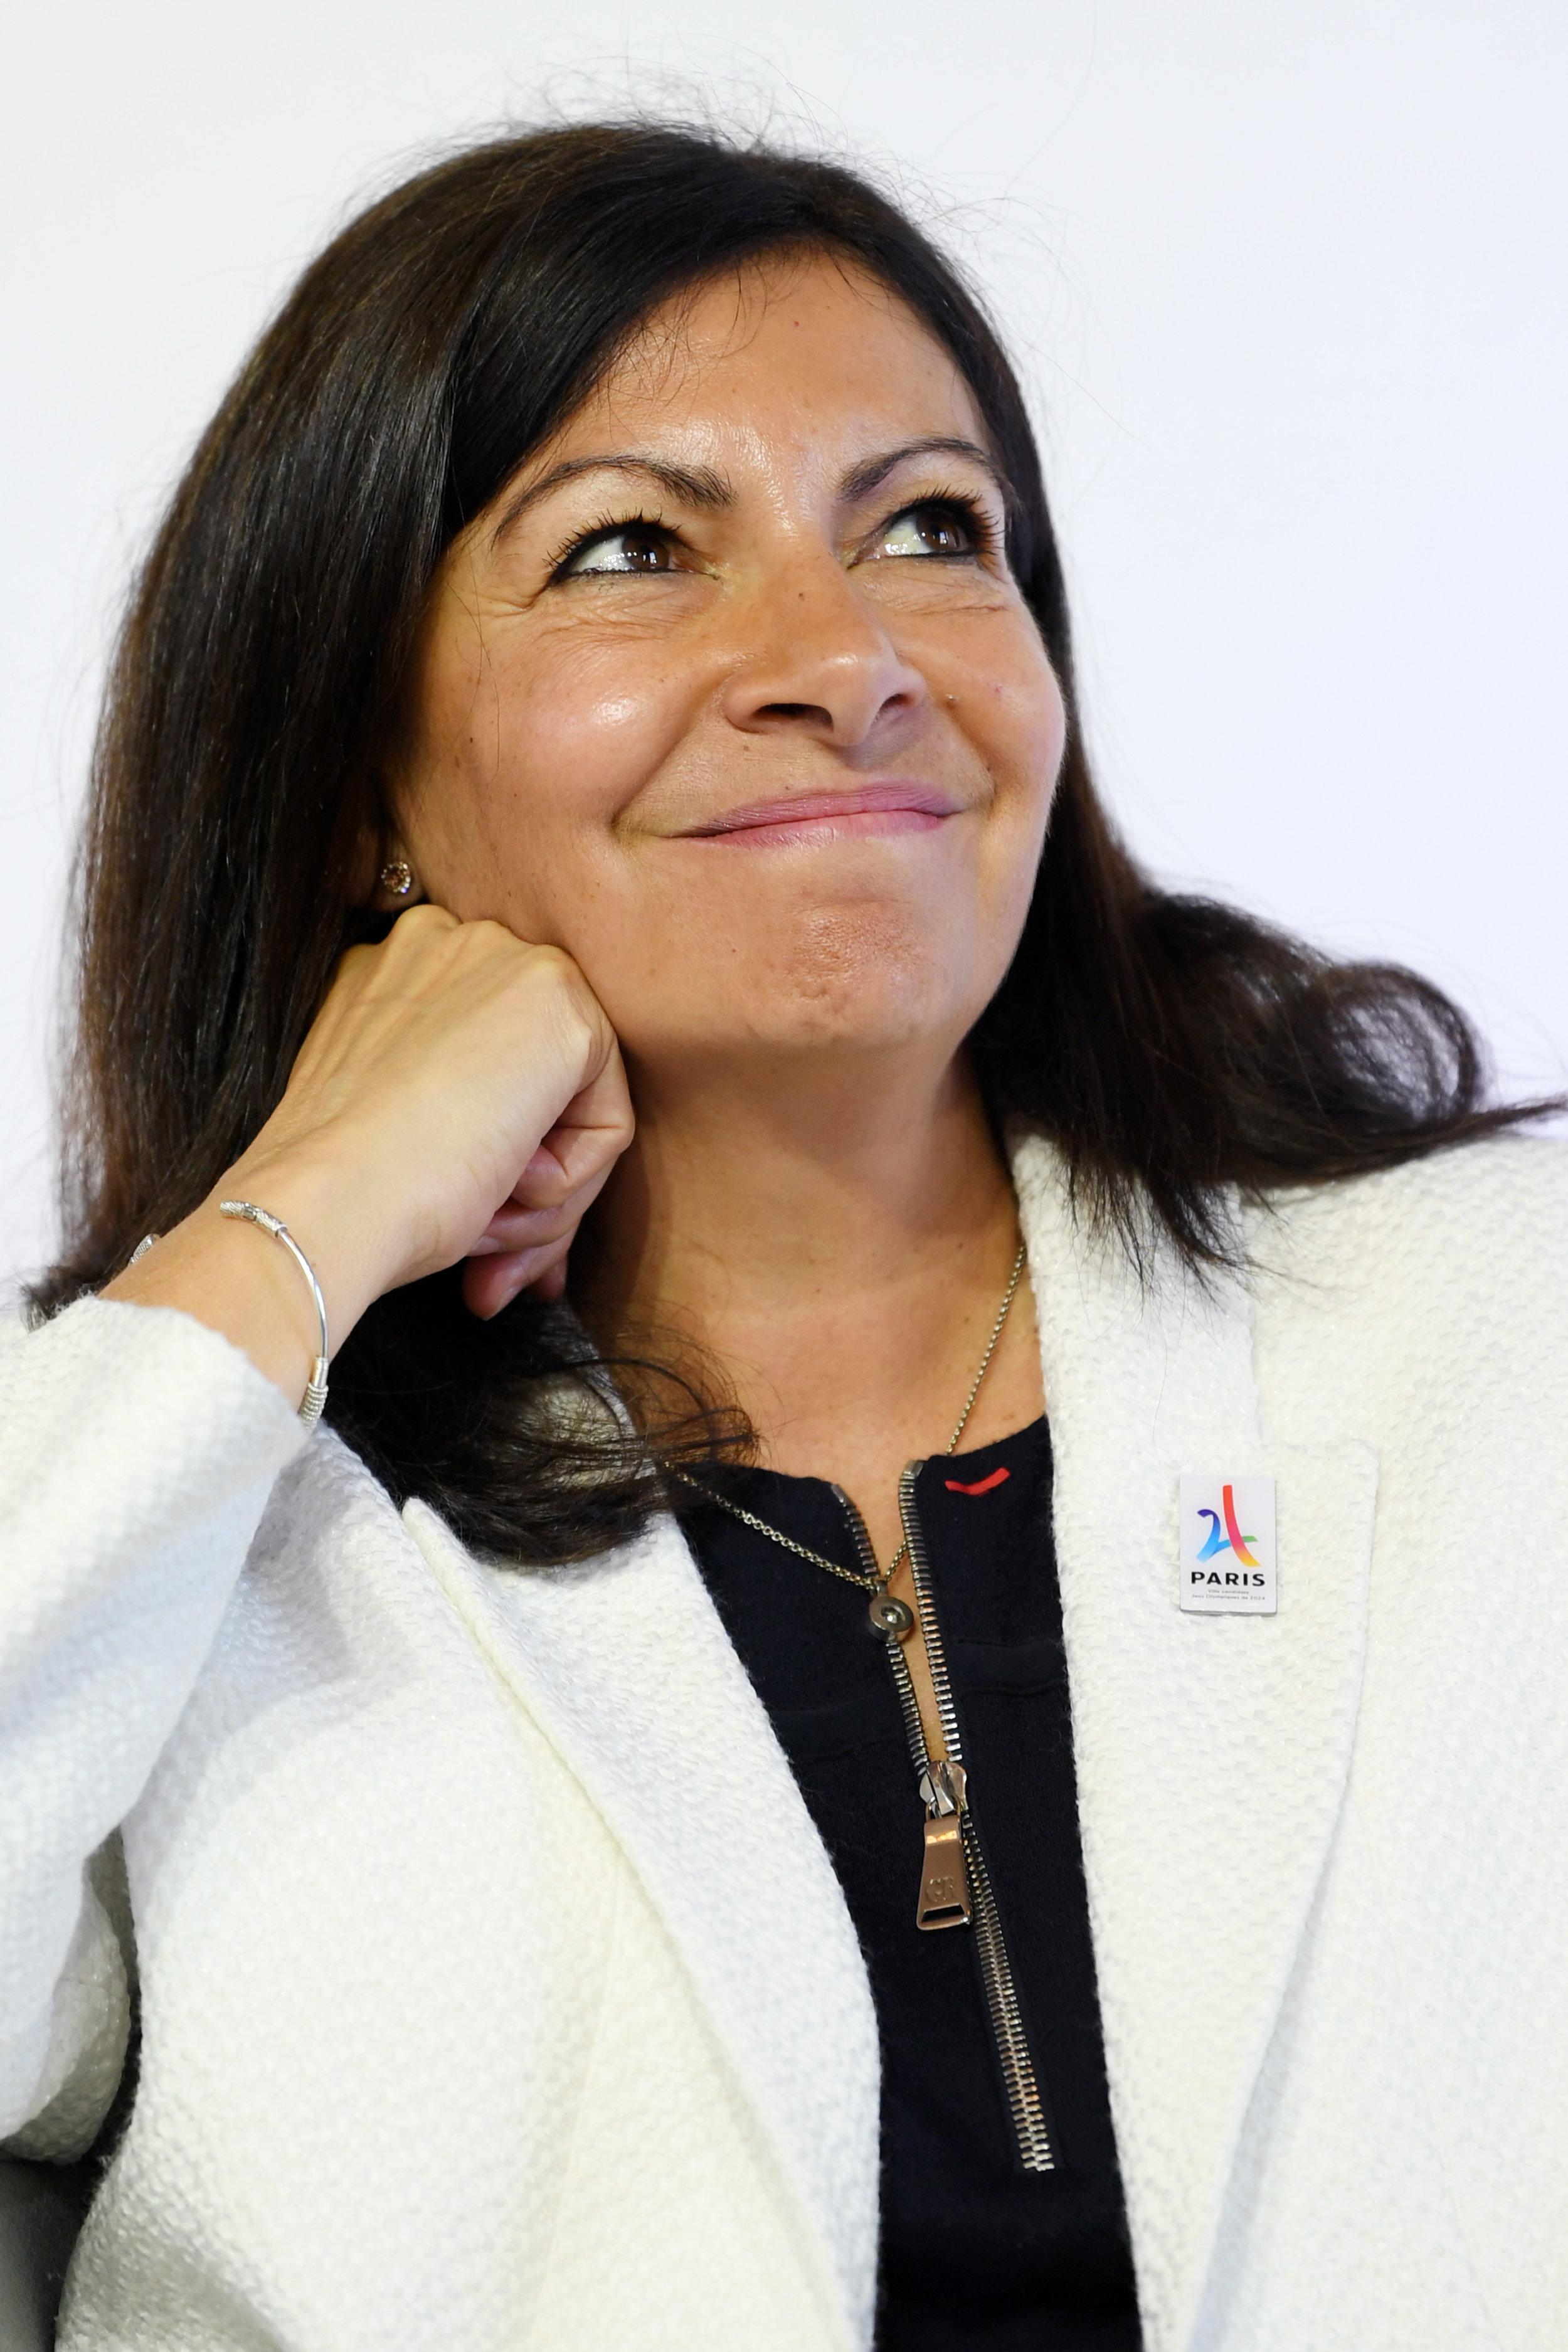 Paris mayor Anne Hidalgo during Tuesday's news conference // Philippe Millereau / KMSP / Paris 2024